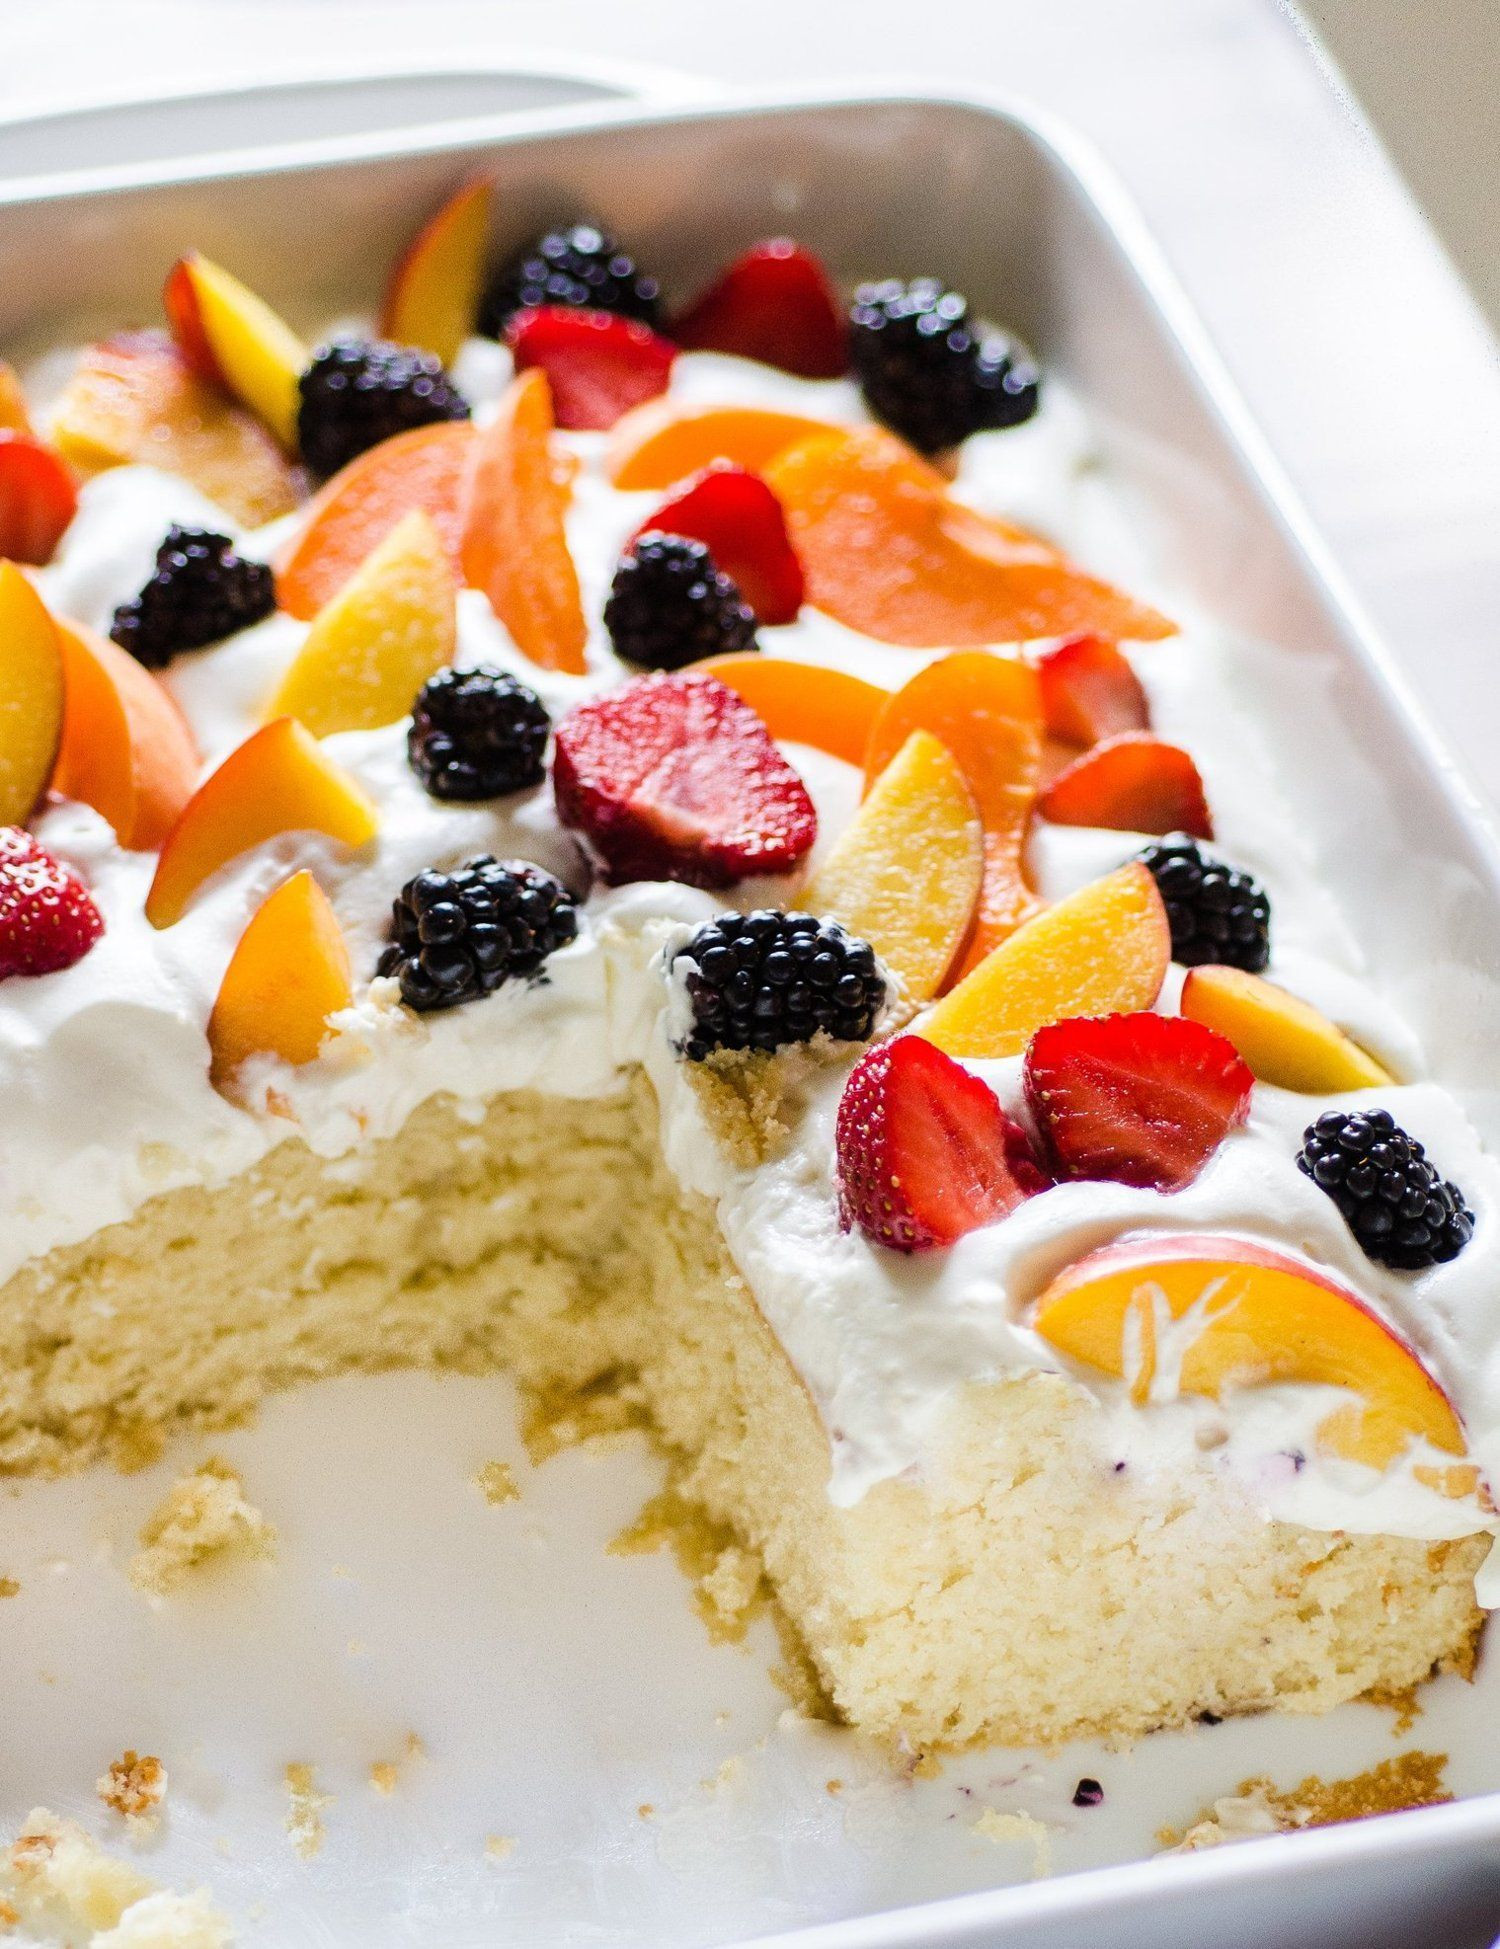 Easy Fruit Desserts  Easy Summer Cake with Fruit & Cream Recipe